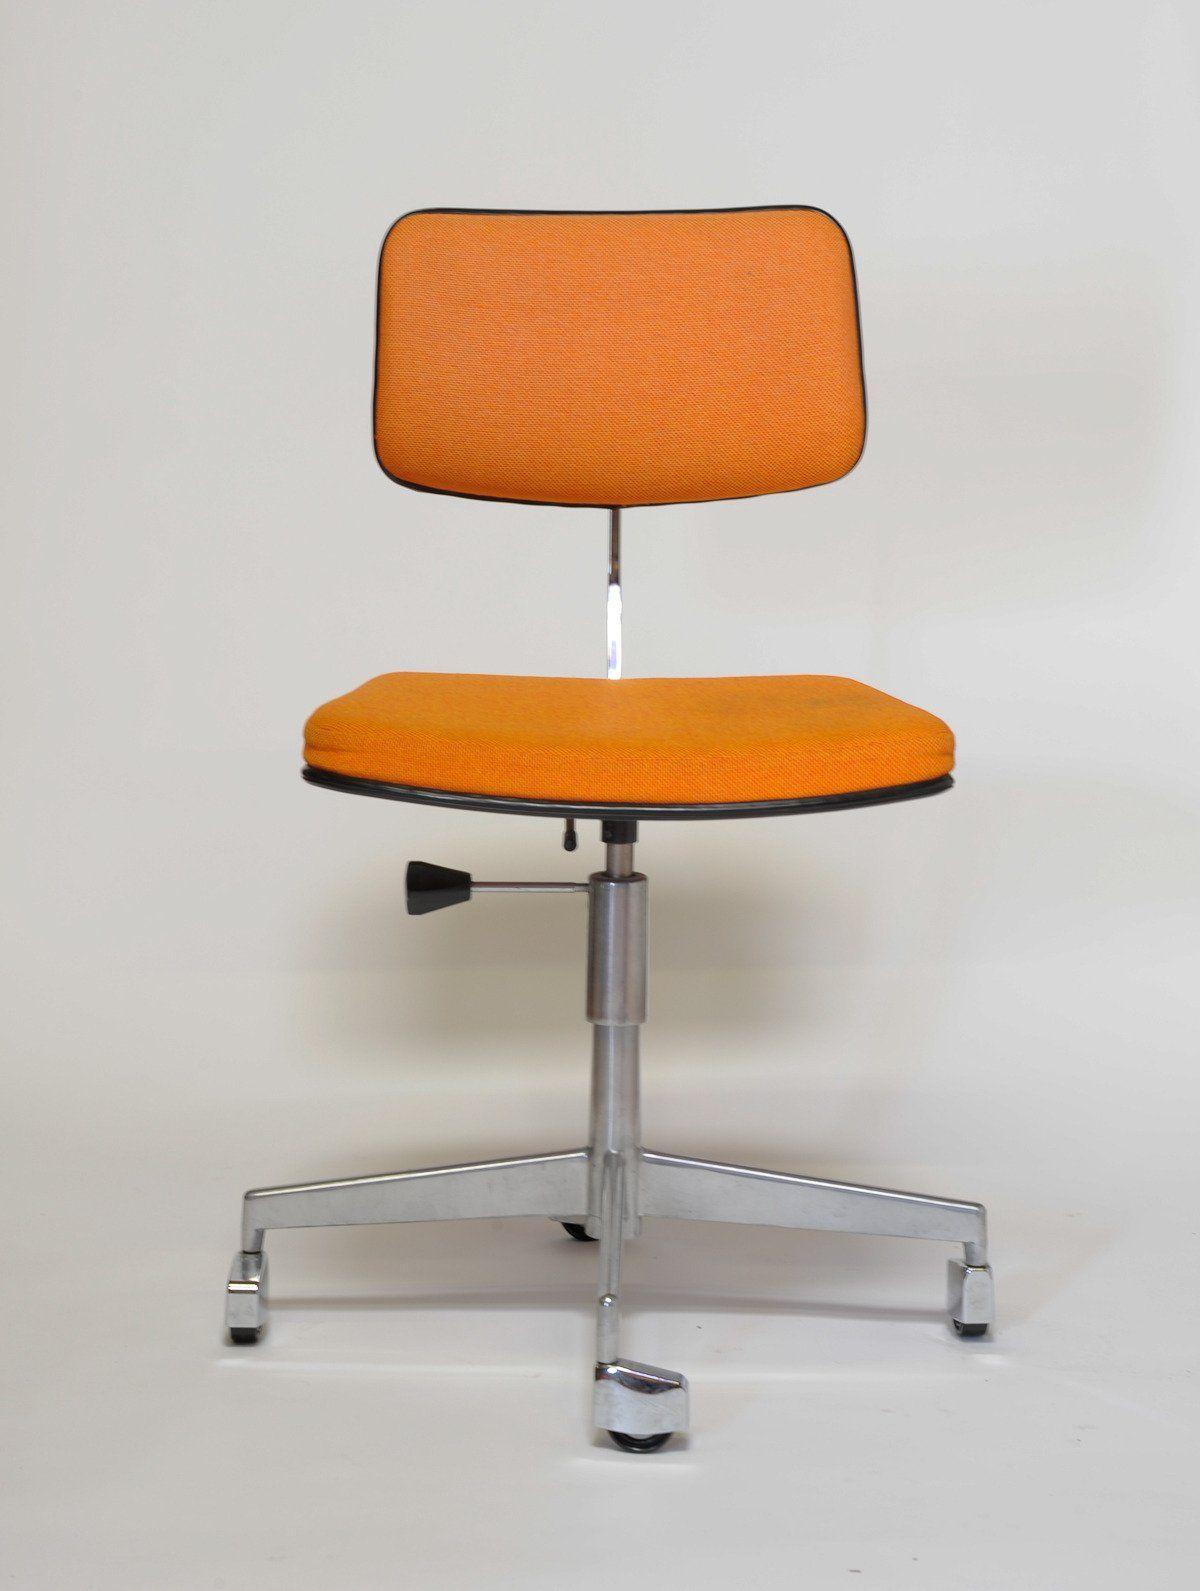 1960s Labofa Danish Rolling Office Chair 2 In 2020 Restaurant